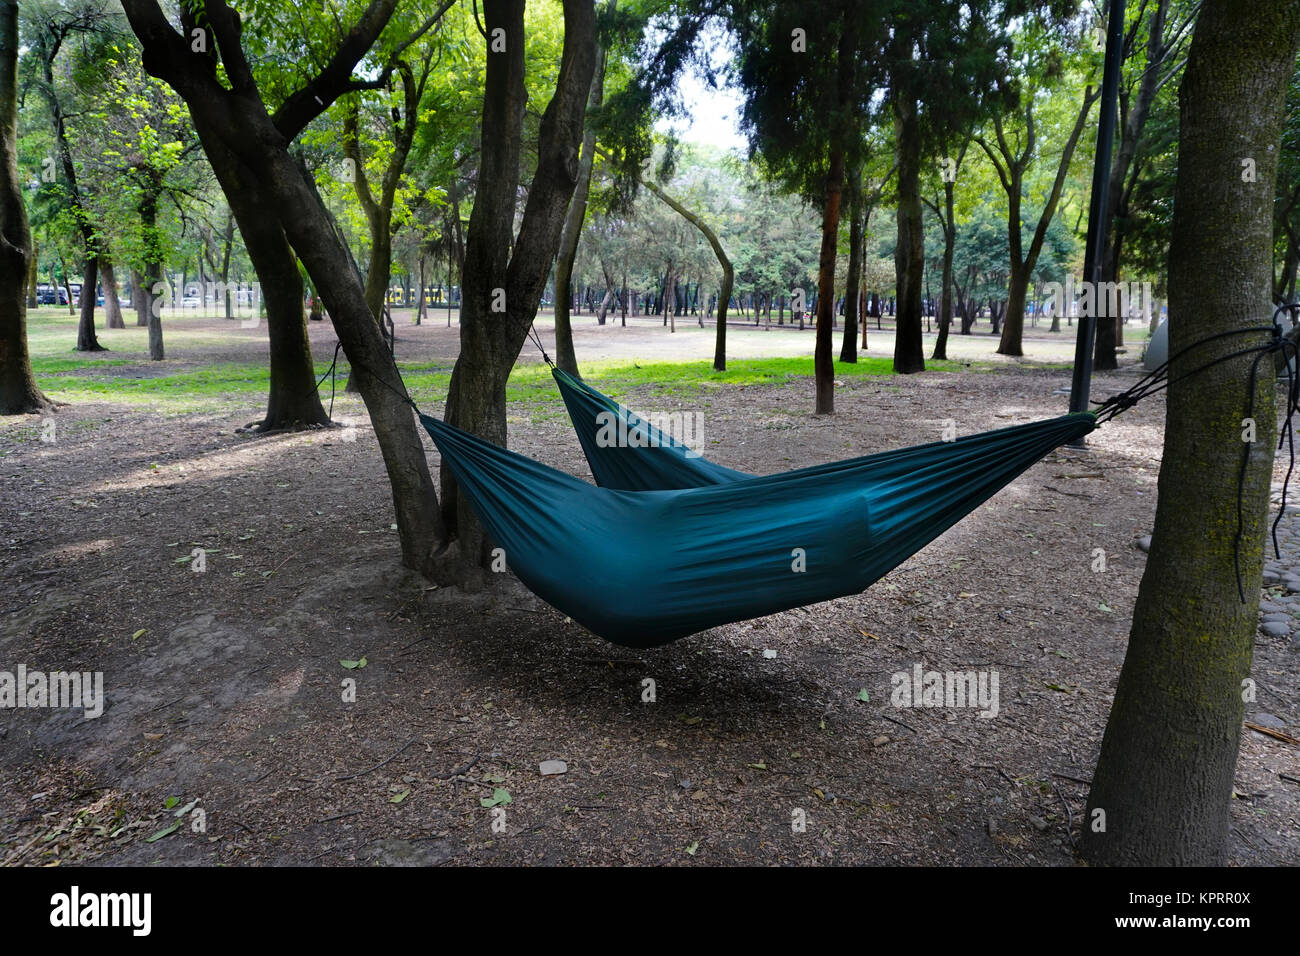 People in hammocks, Chapultepec Park, Mexico City, DF, Mexico, - Stock Image